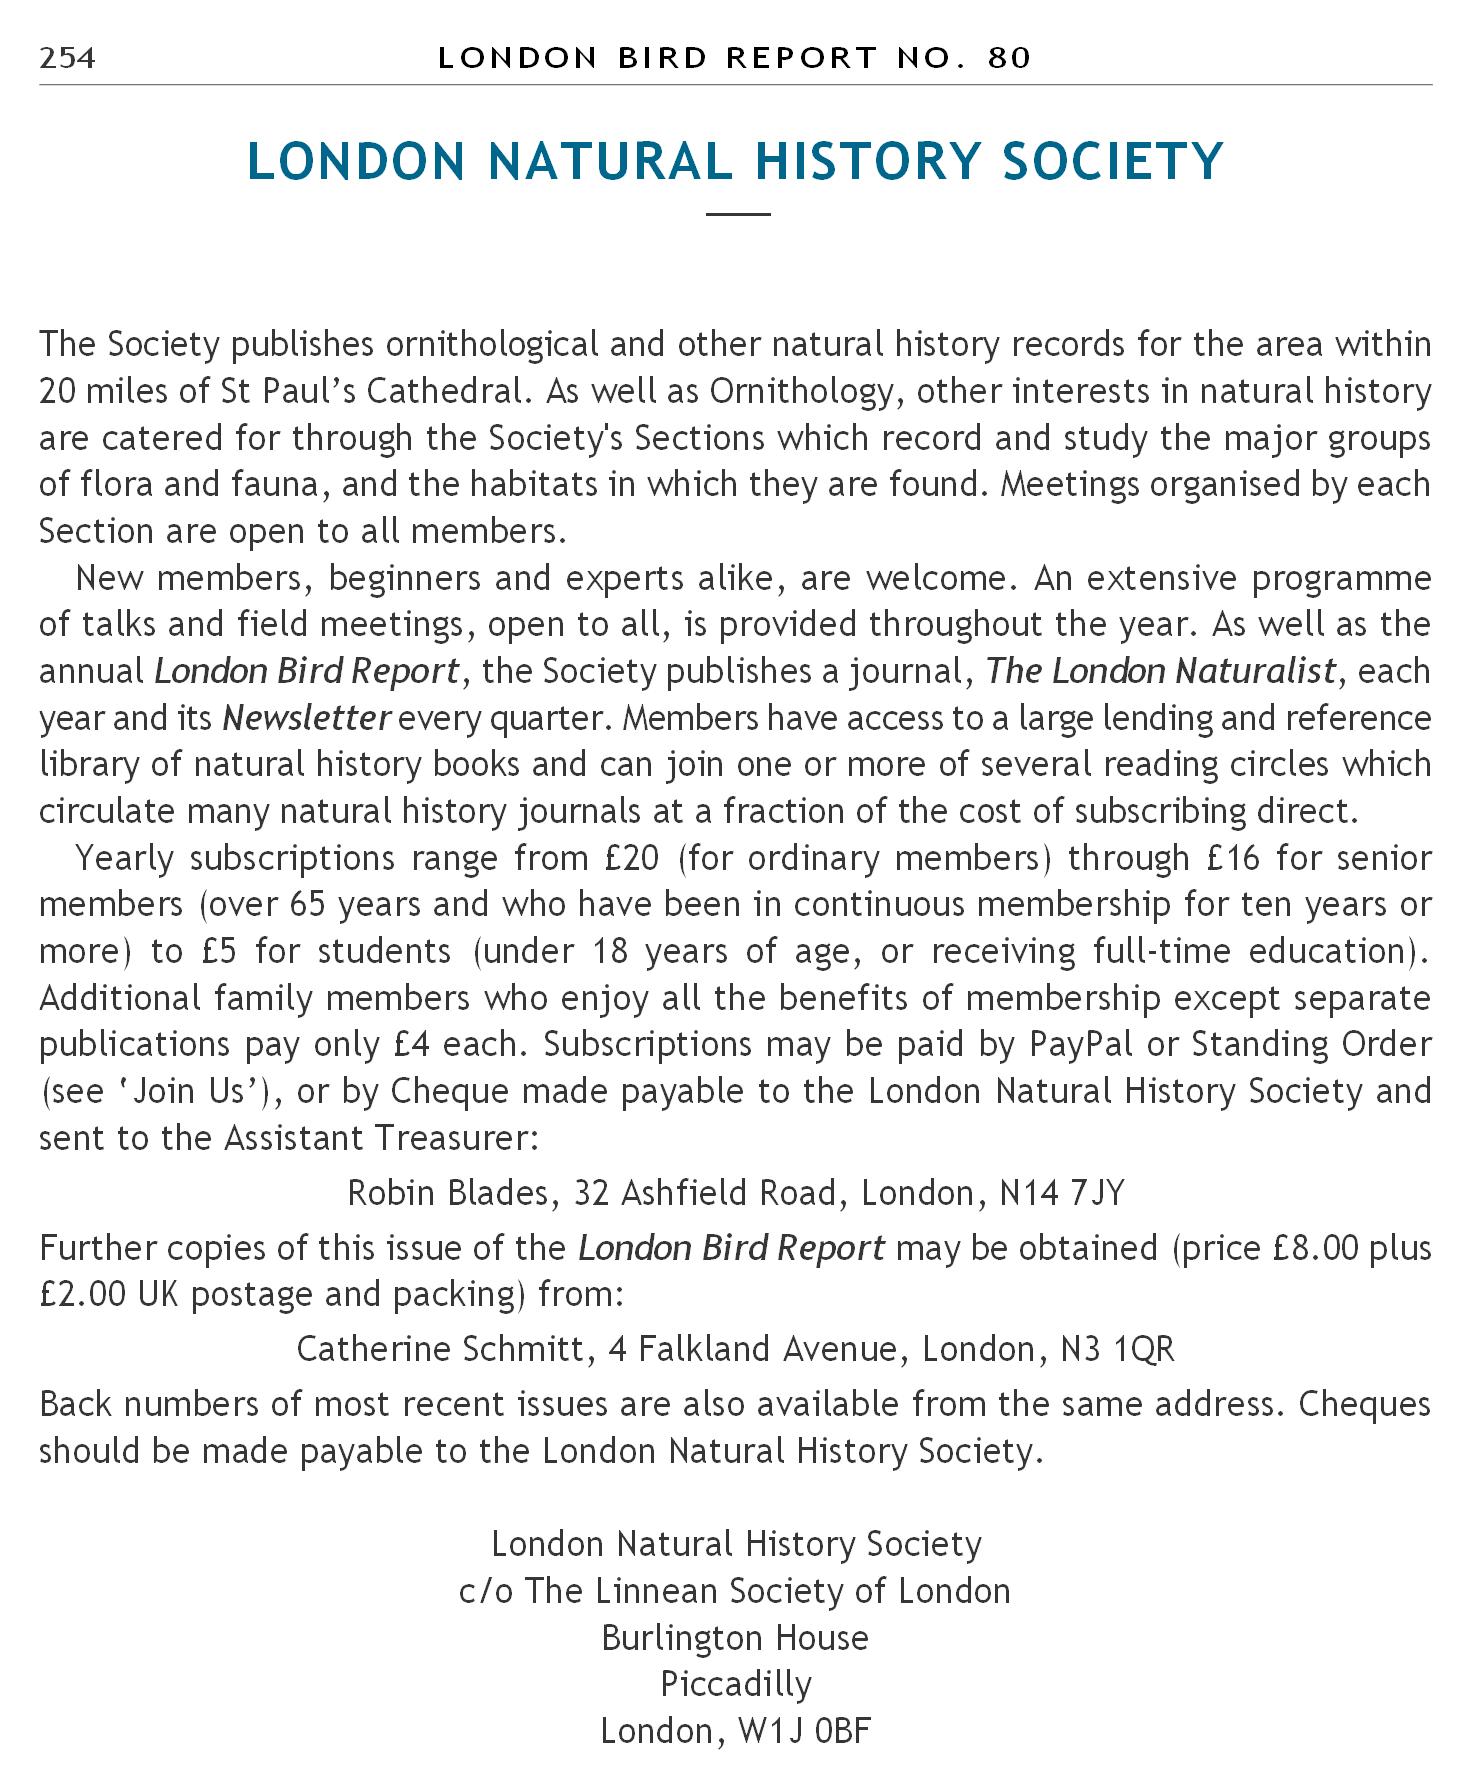 london natural history society london bird report